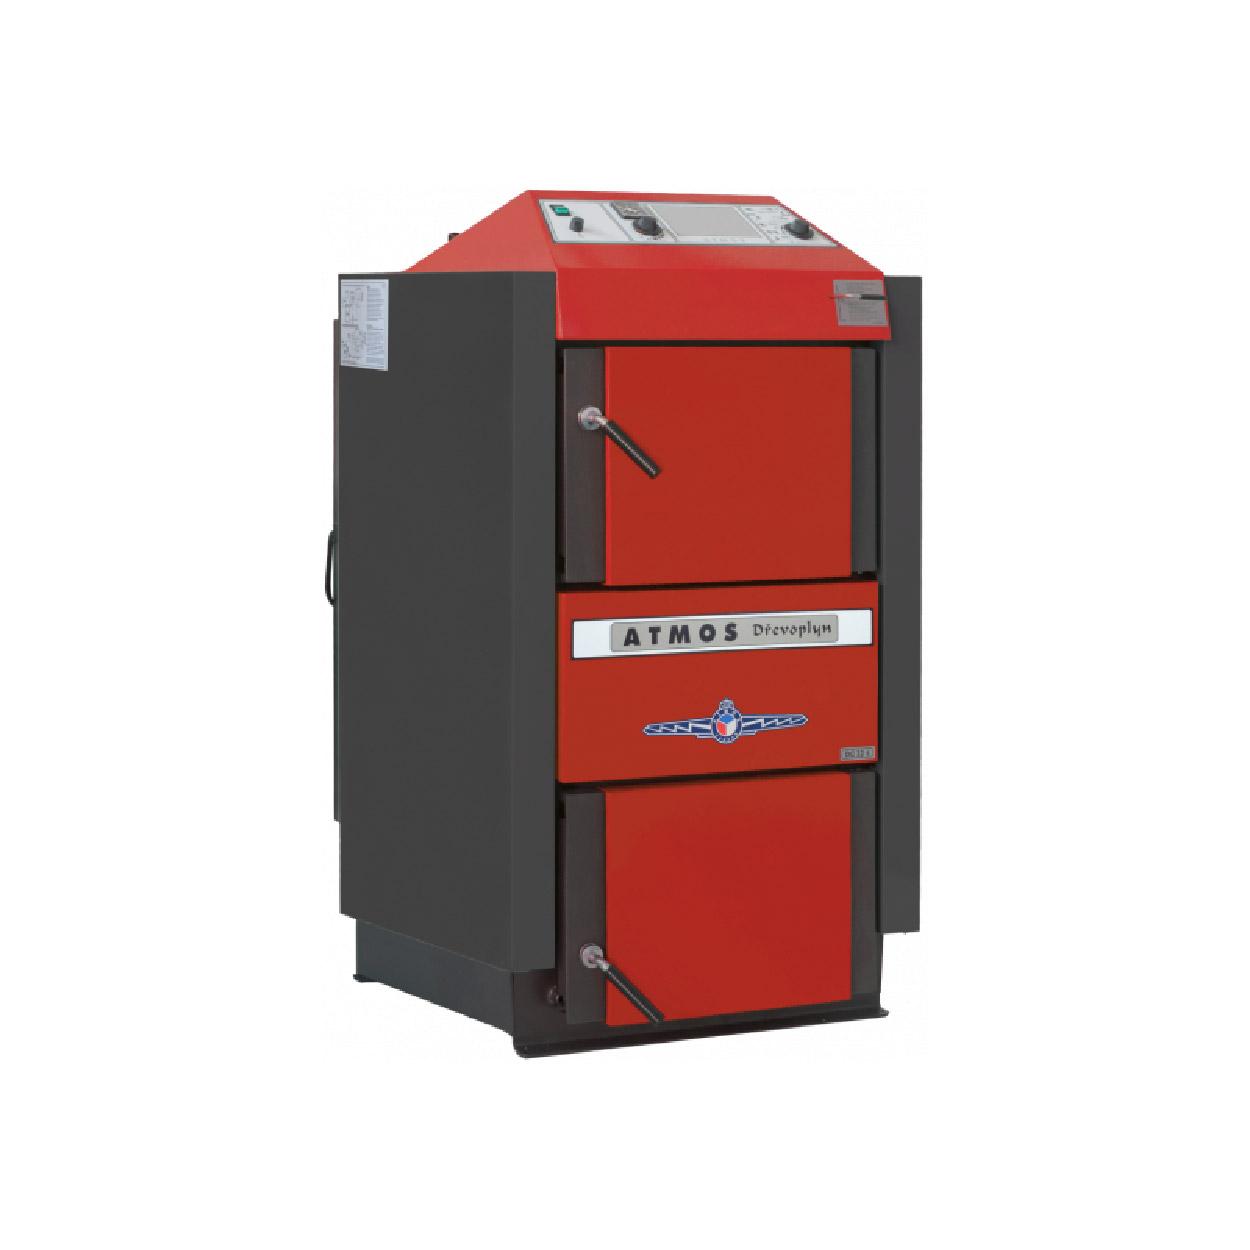 Centrala termica pe lemne ATMOS DC32S 35 kw fornello imagine